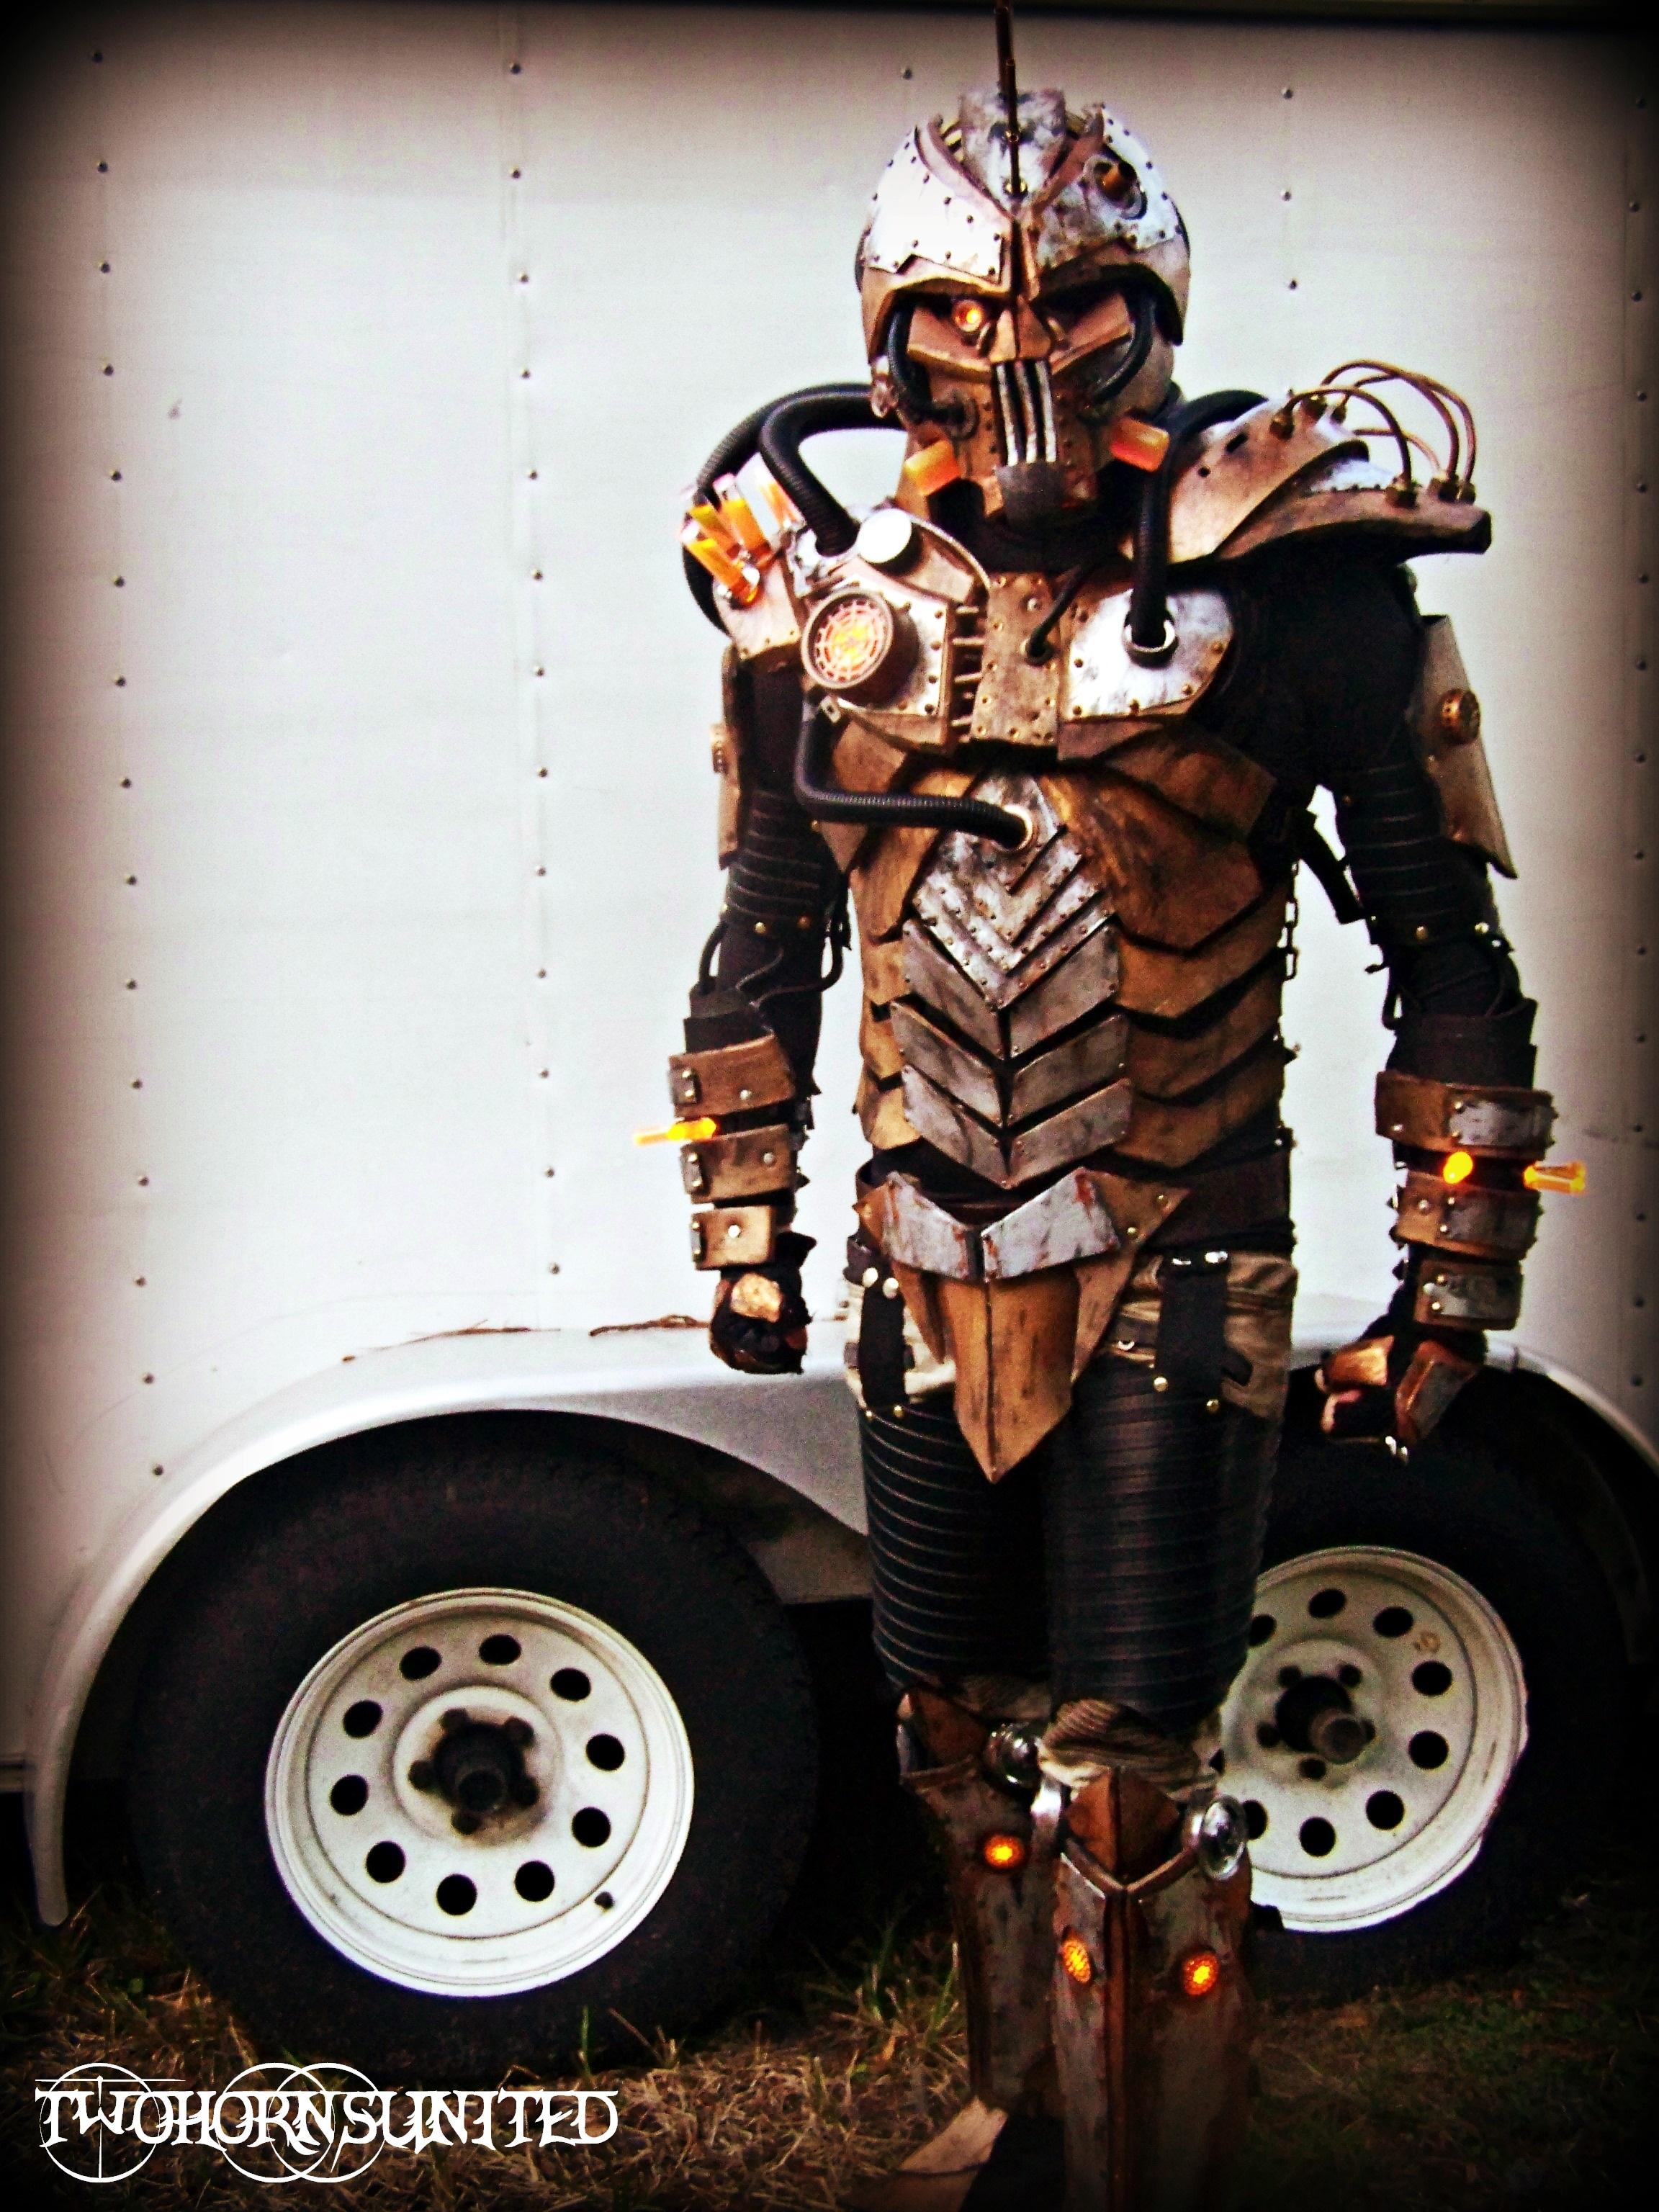 The Steam freak 2.0 light up full Steampunk armor by TwoHornsUnited